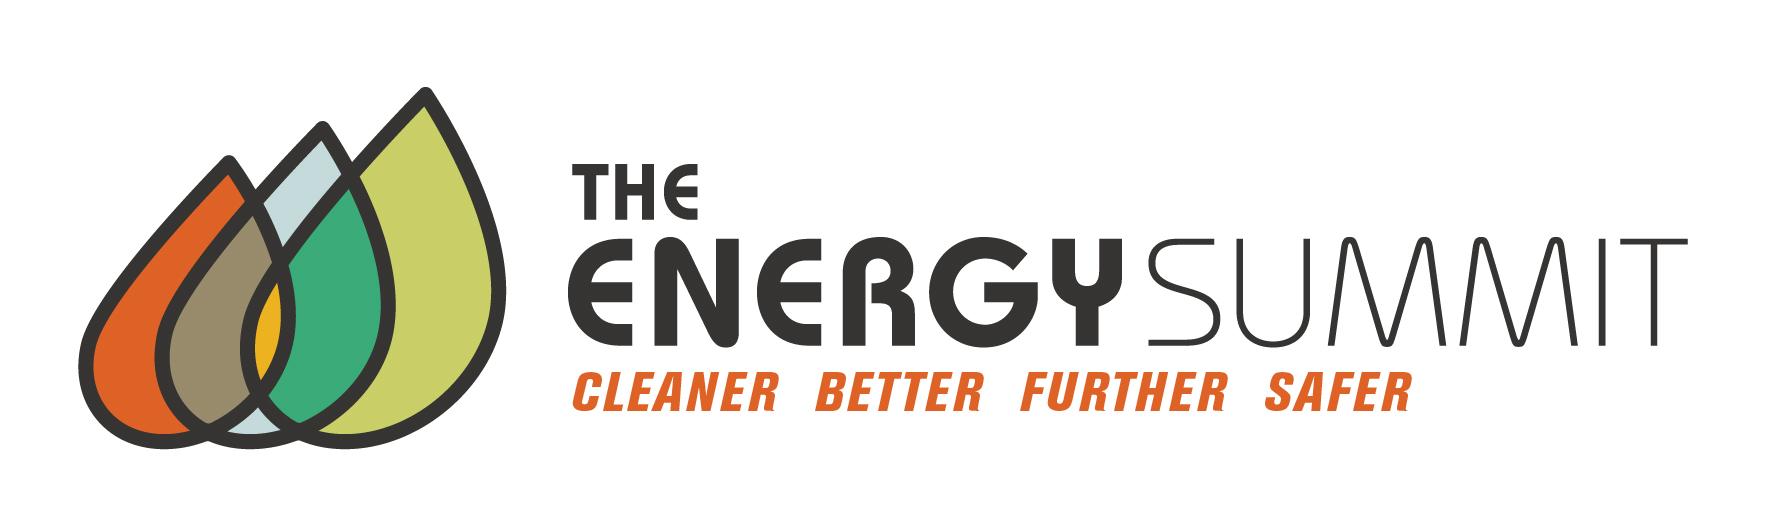 The Energy Summit 2017